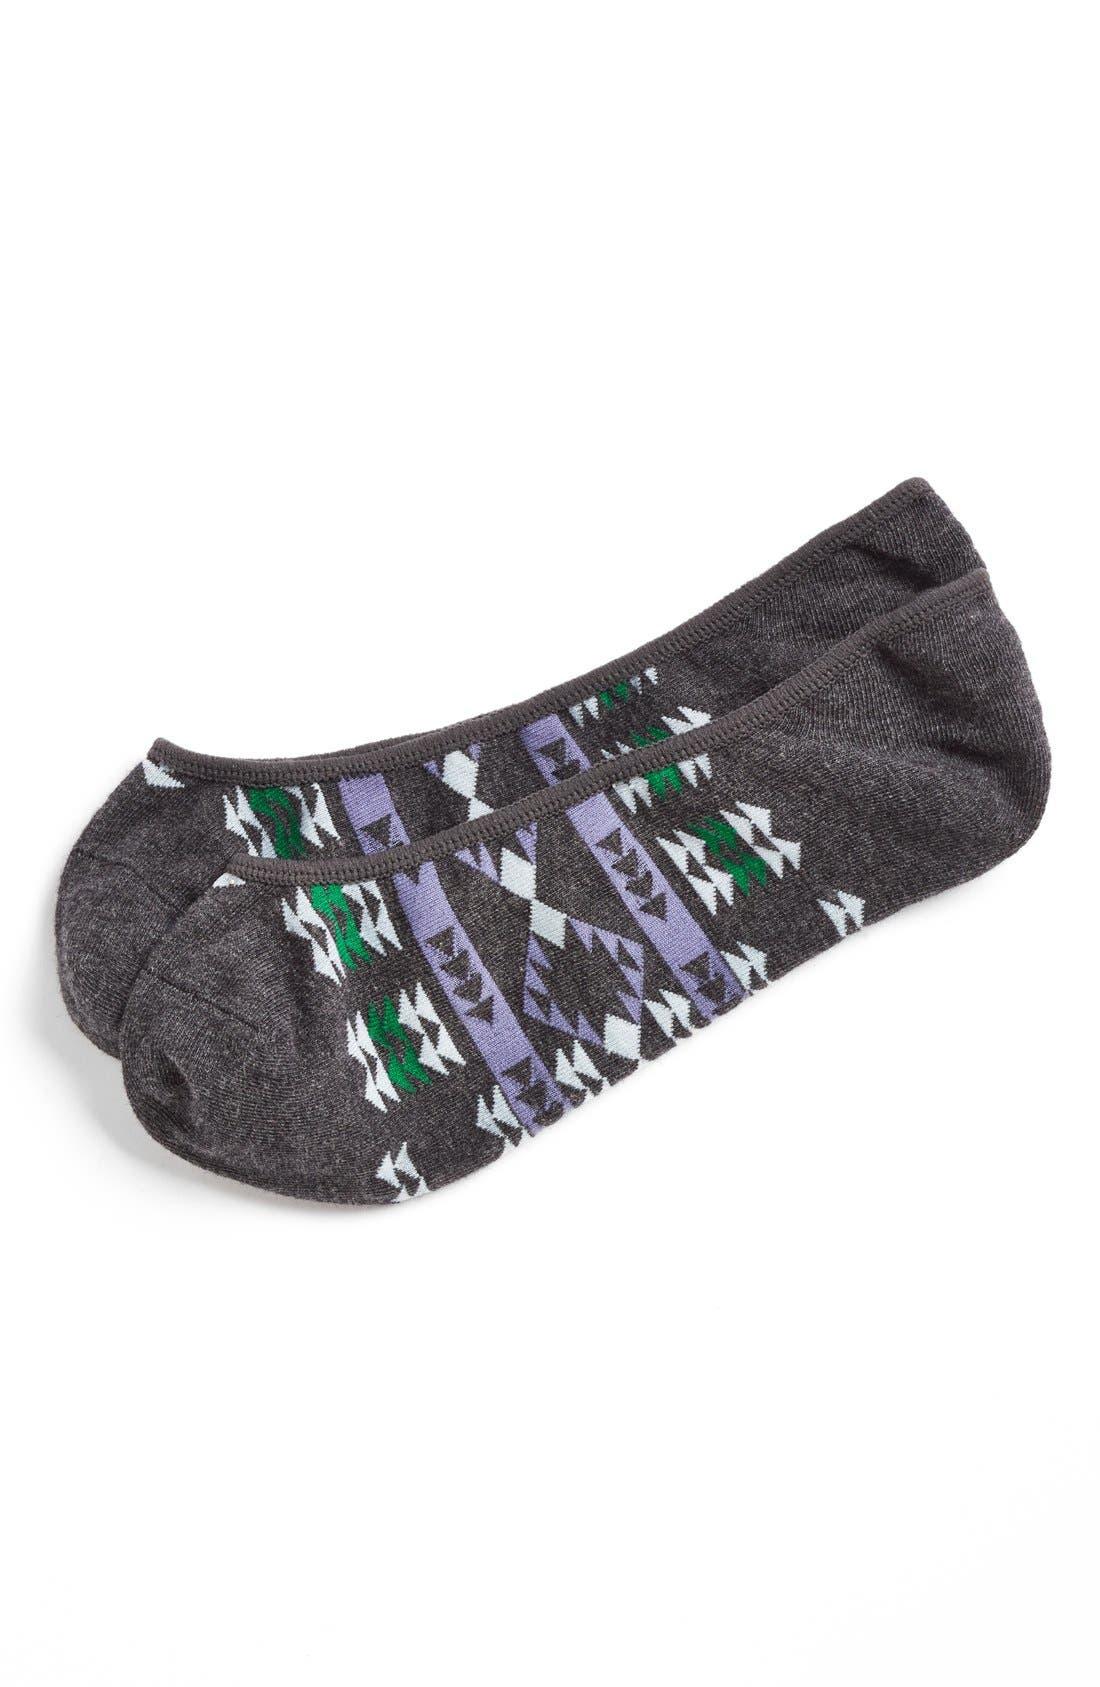 Alternate Image 1 Selected - 1901 Blanket Stripe No-Show Socks